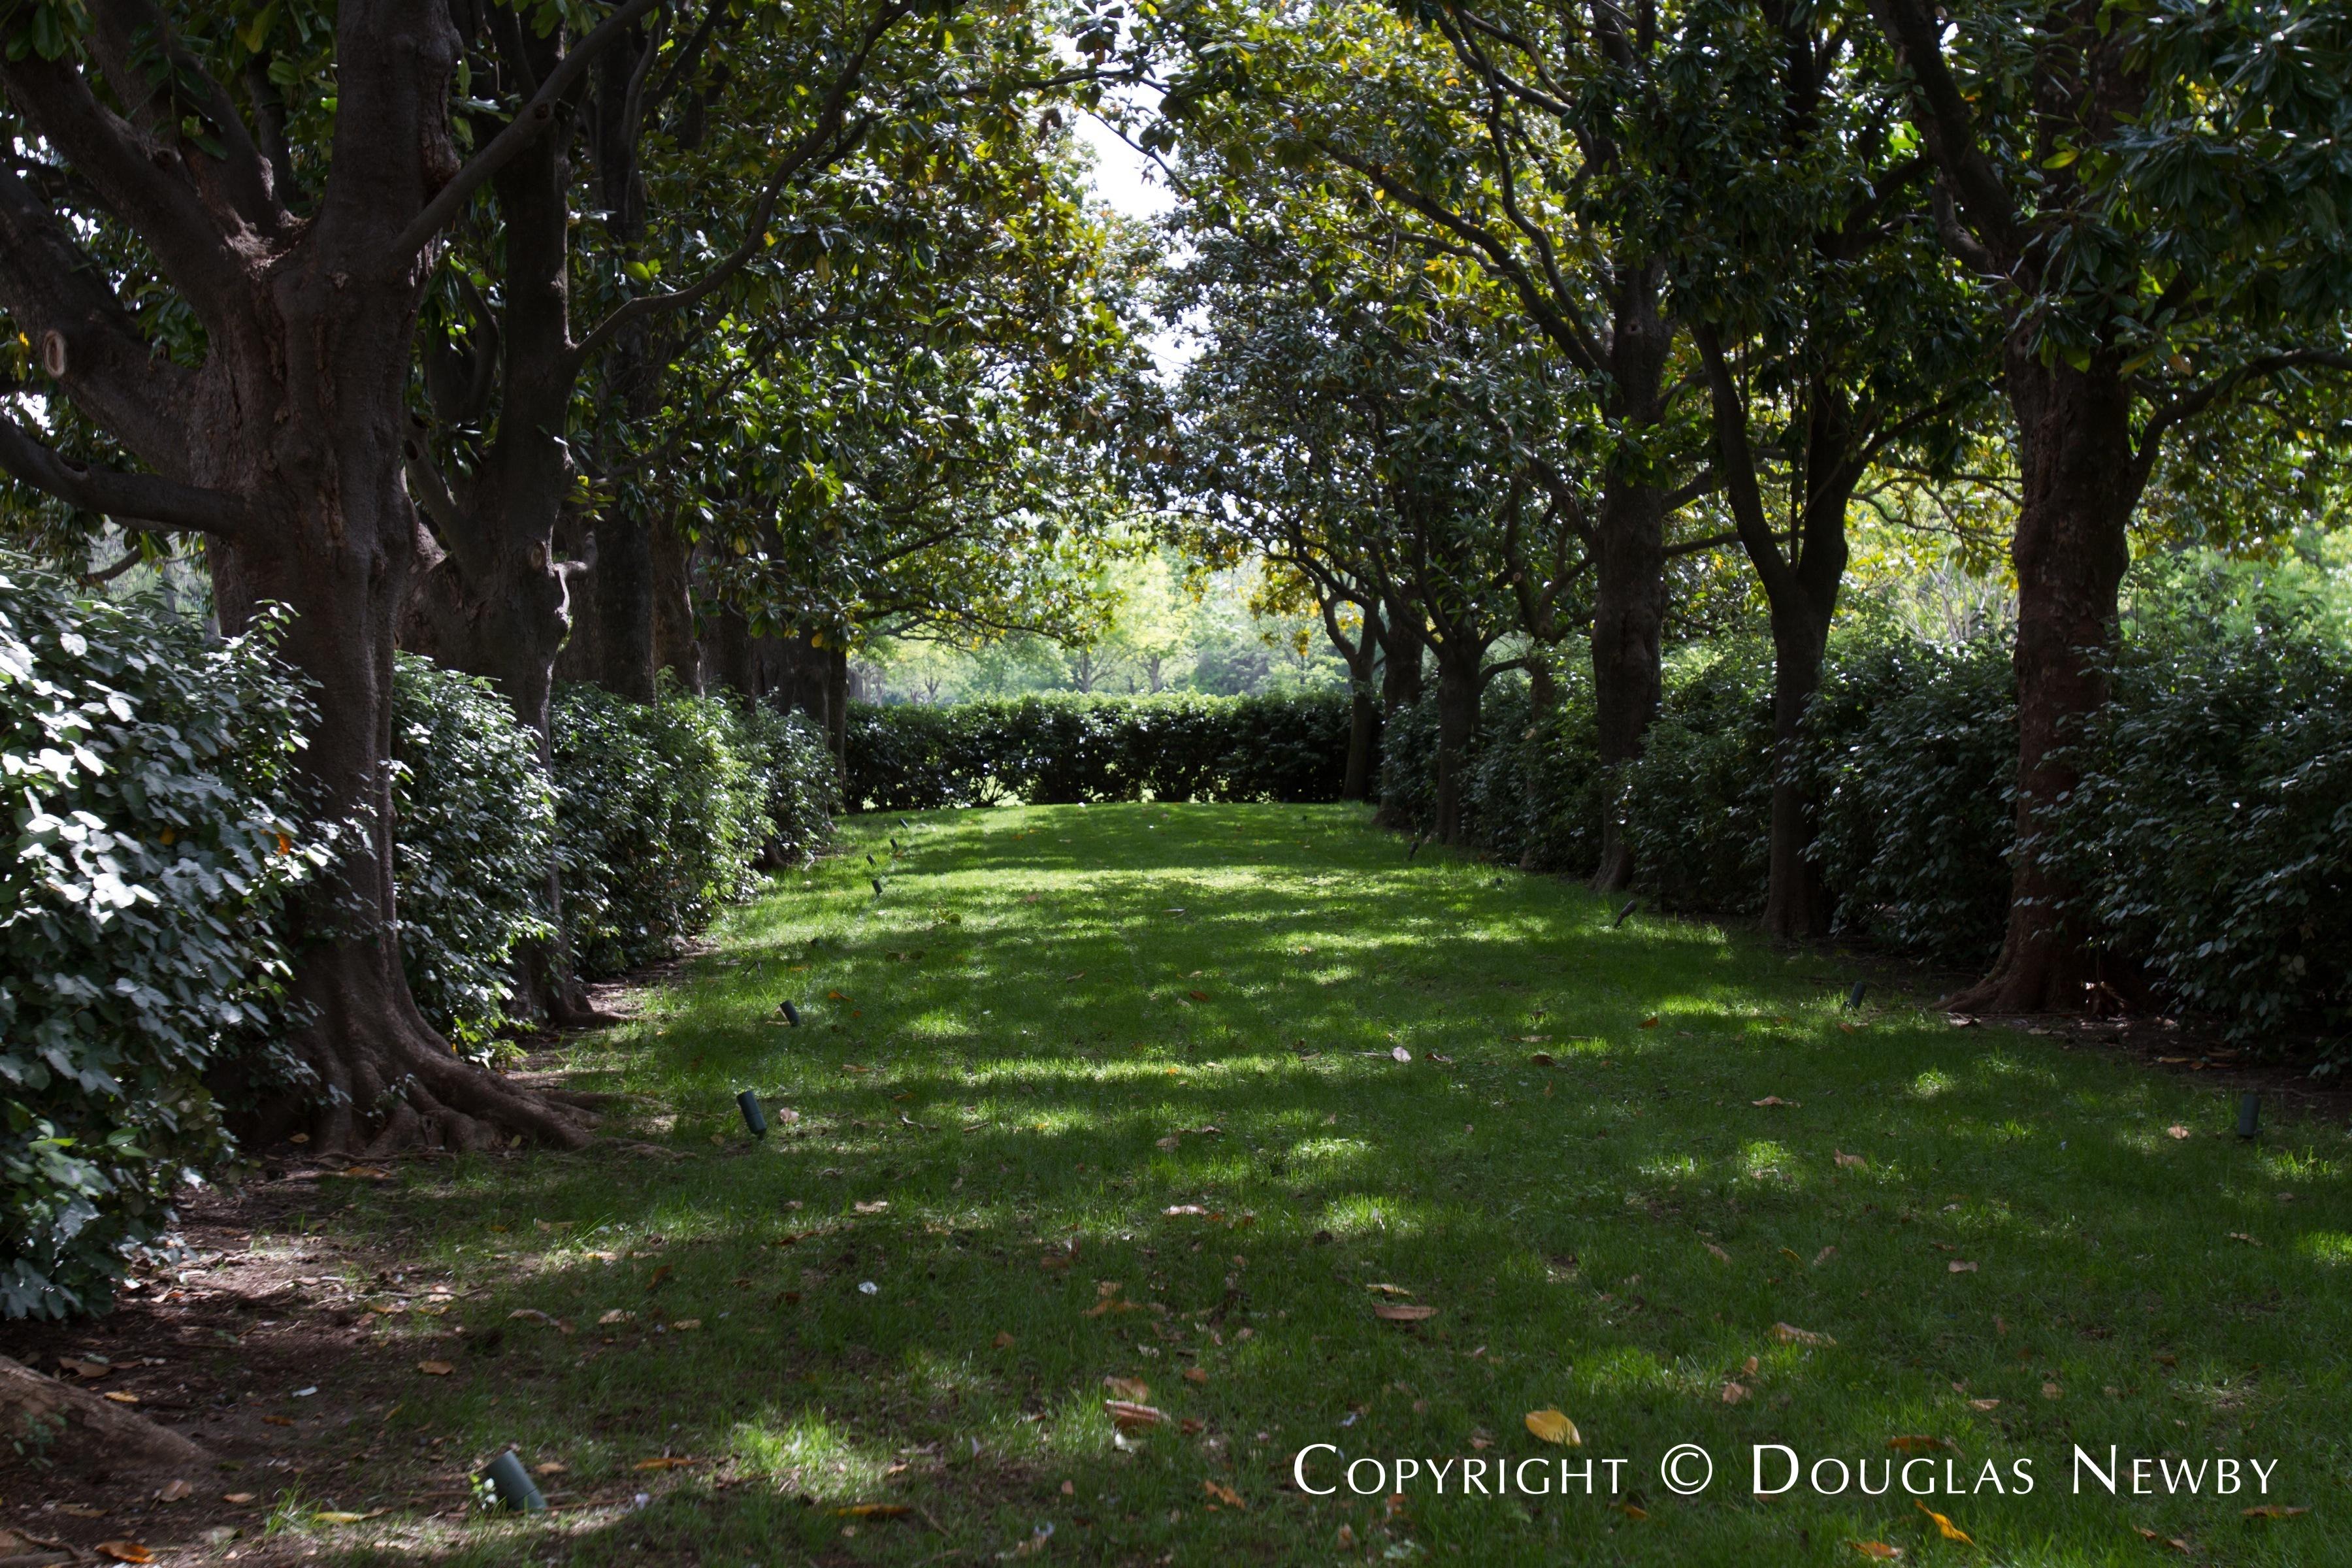 Tree Covered Landscape on Dallas Estate Property